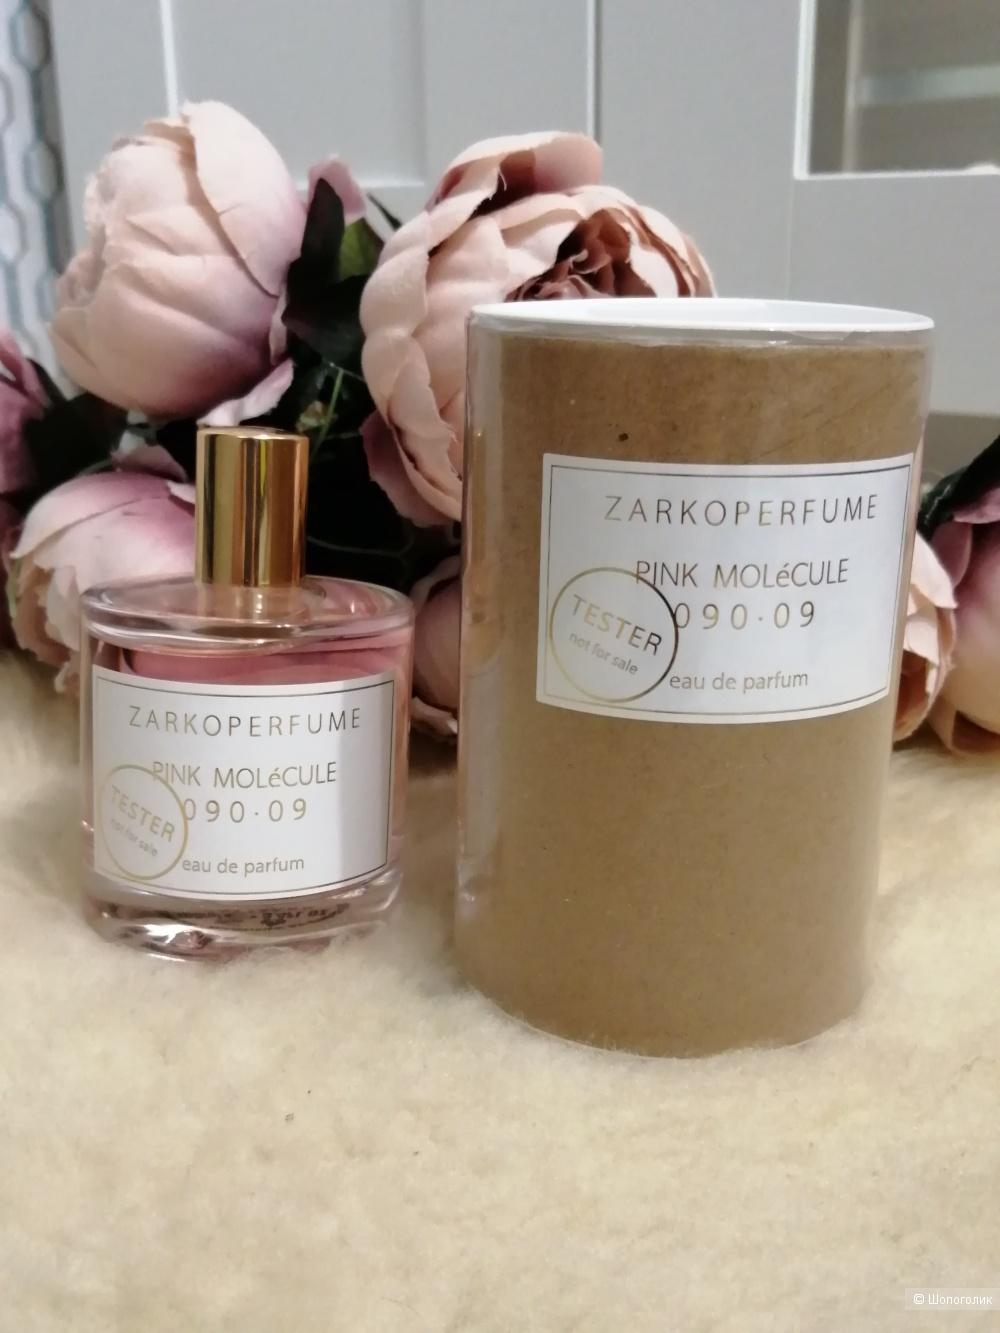 Парюм Zarkoperfume «pink molécule 090.09» (Розовая молекула) 100мл